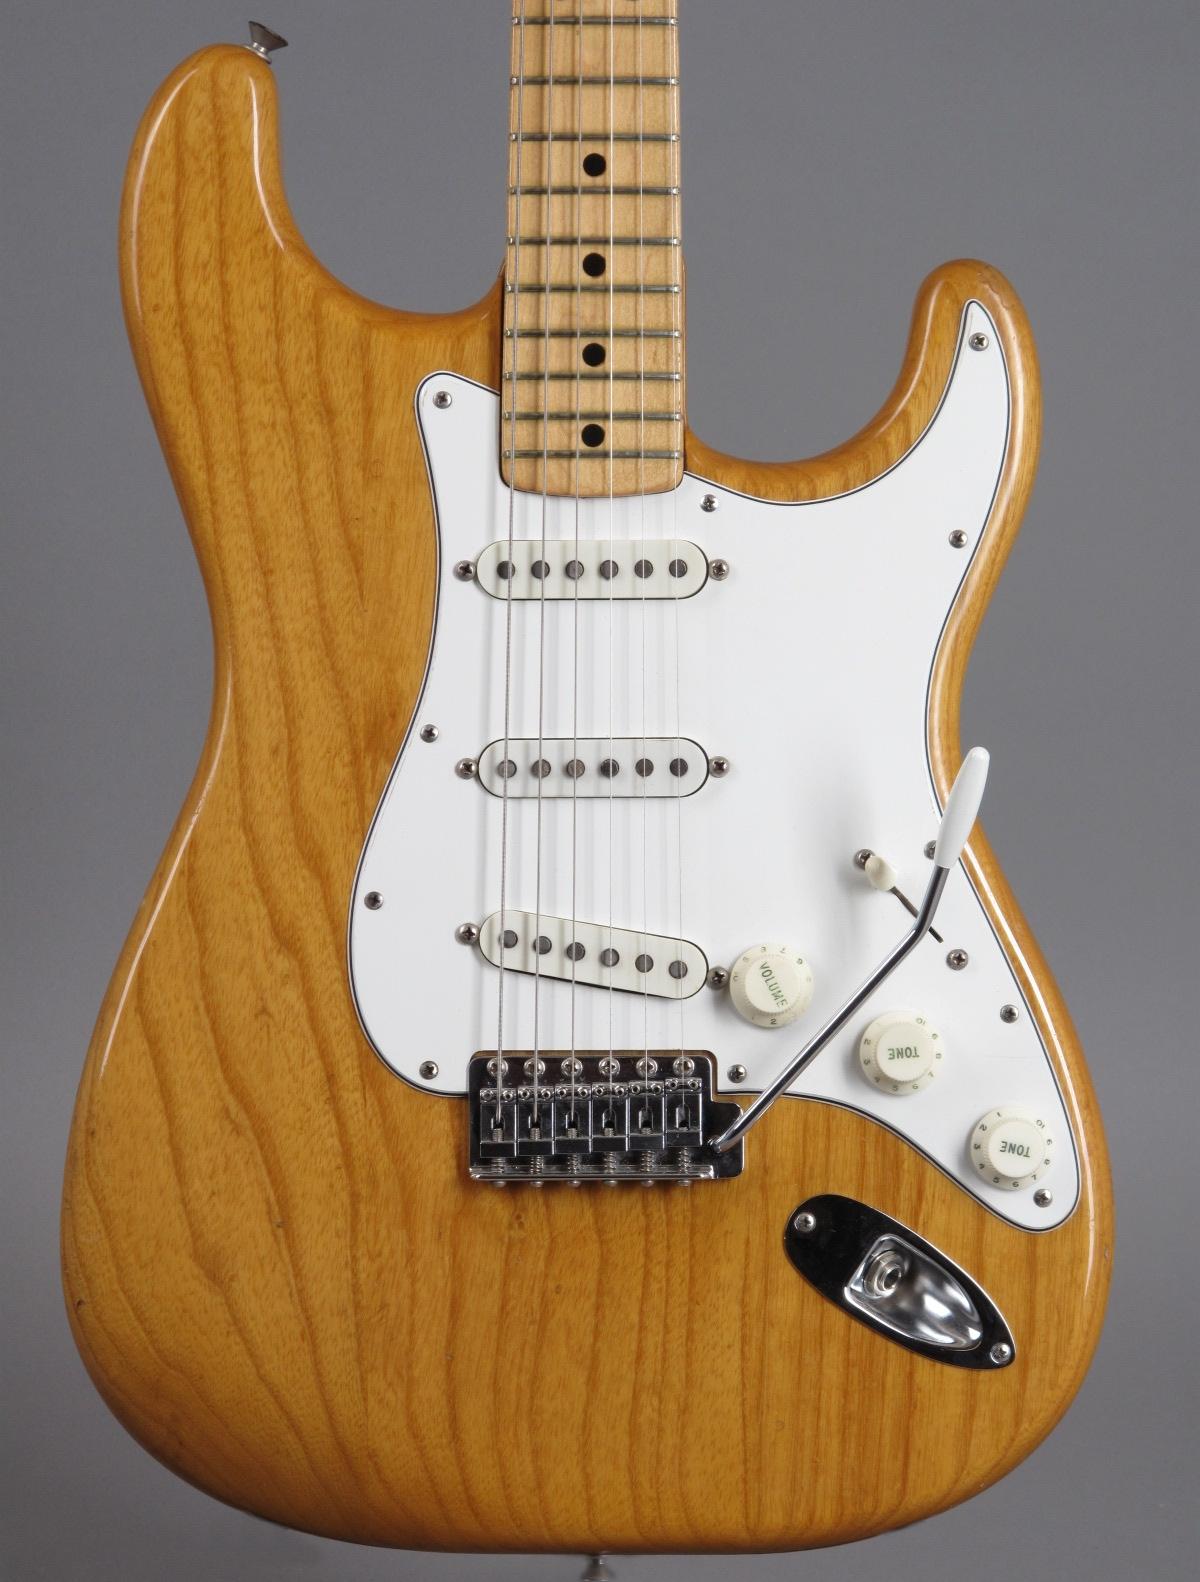 1974 Fender Stratocaster - Natural